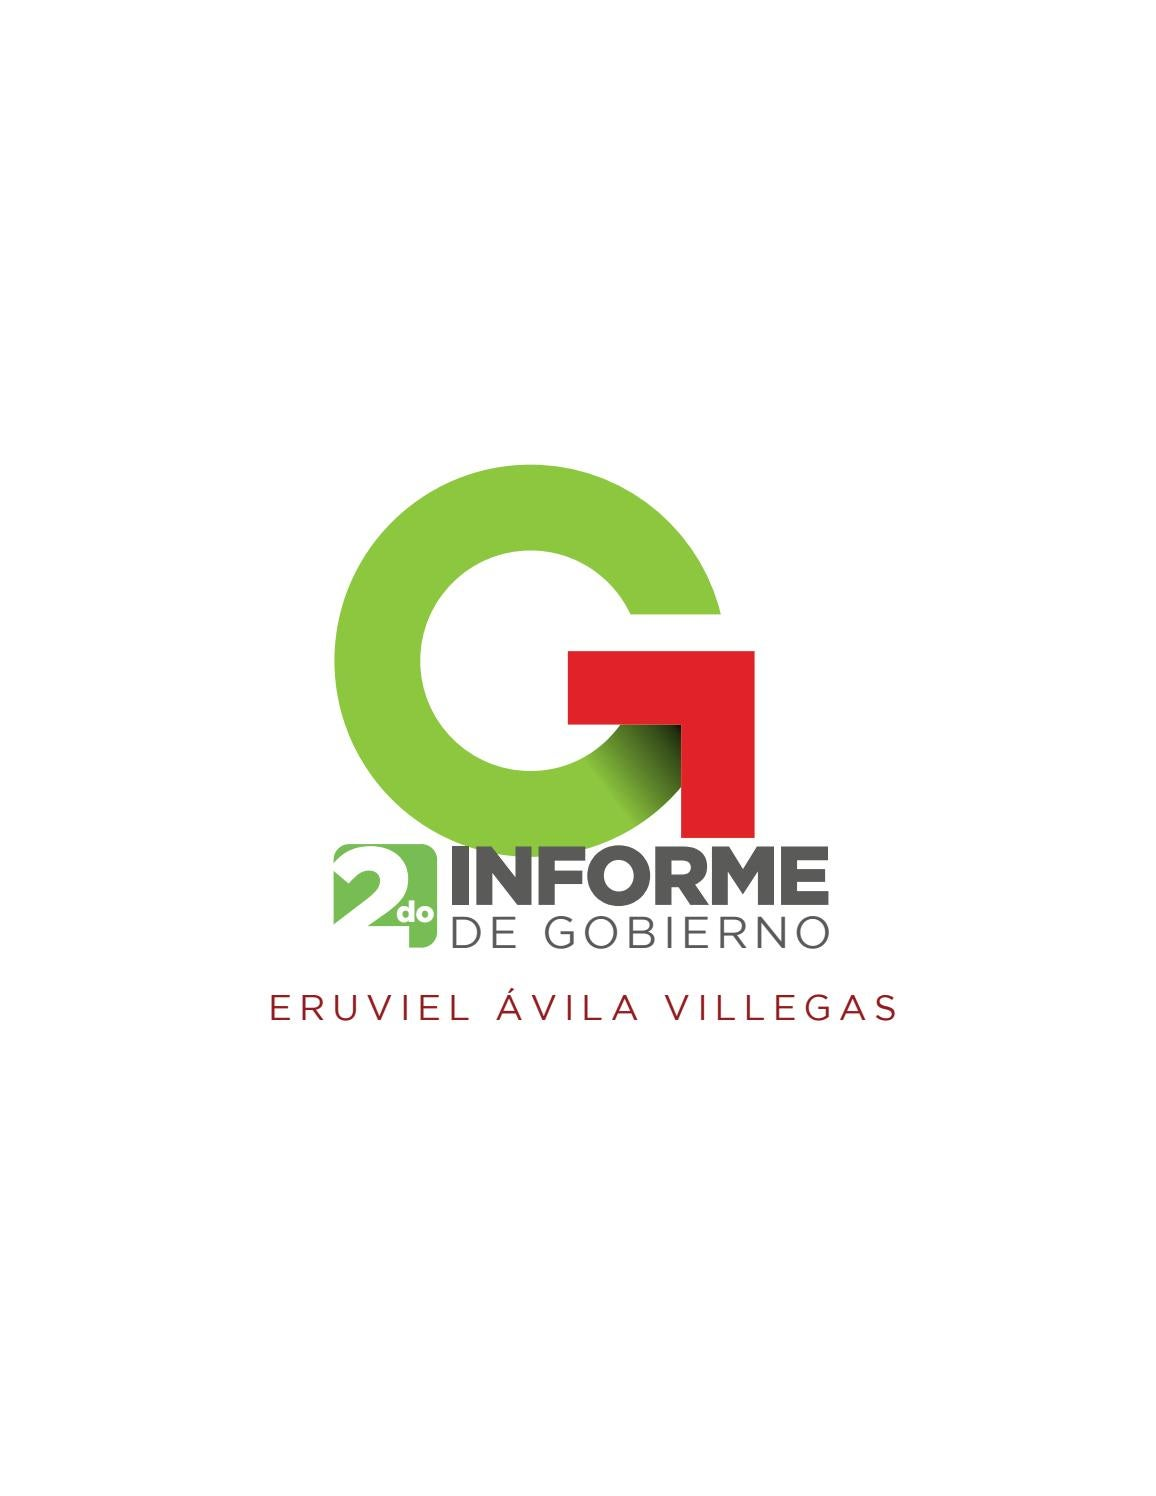 2do informe 2013 by Eruviel Ávila - issuu